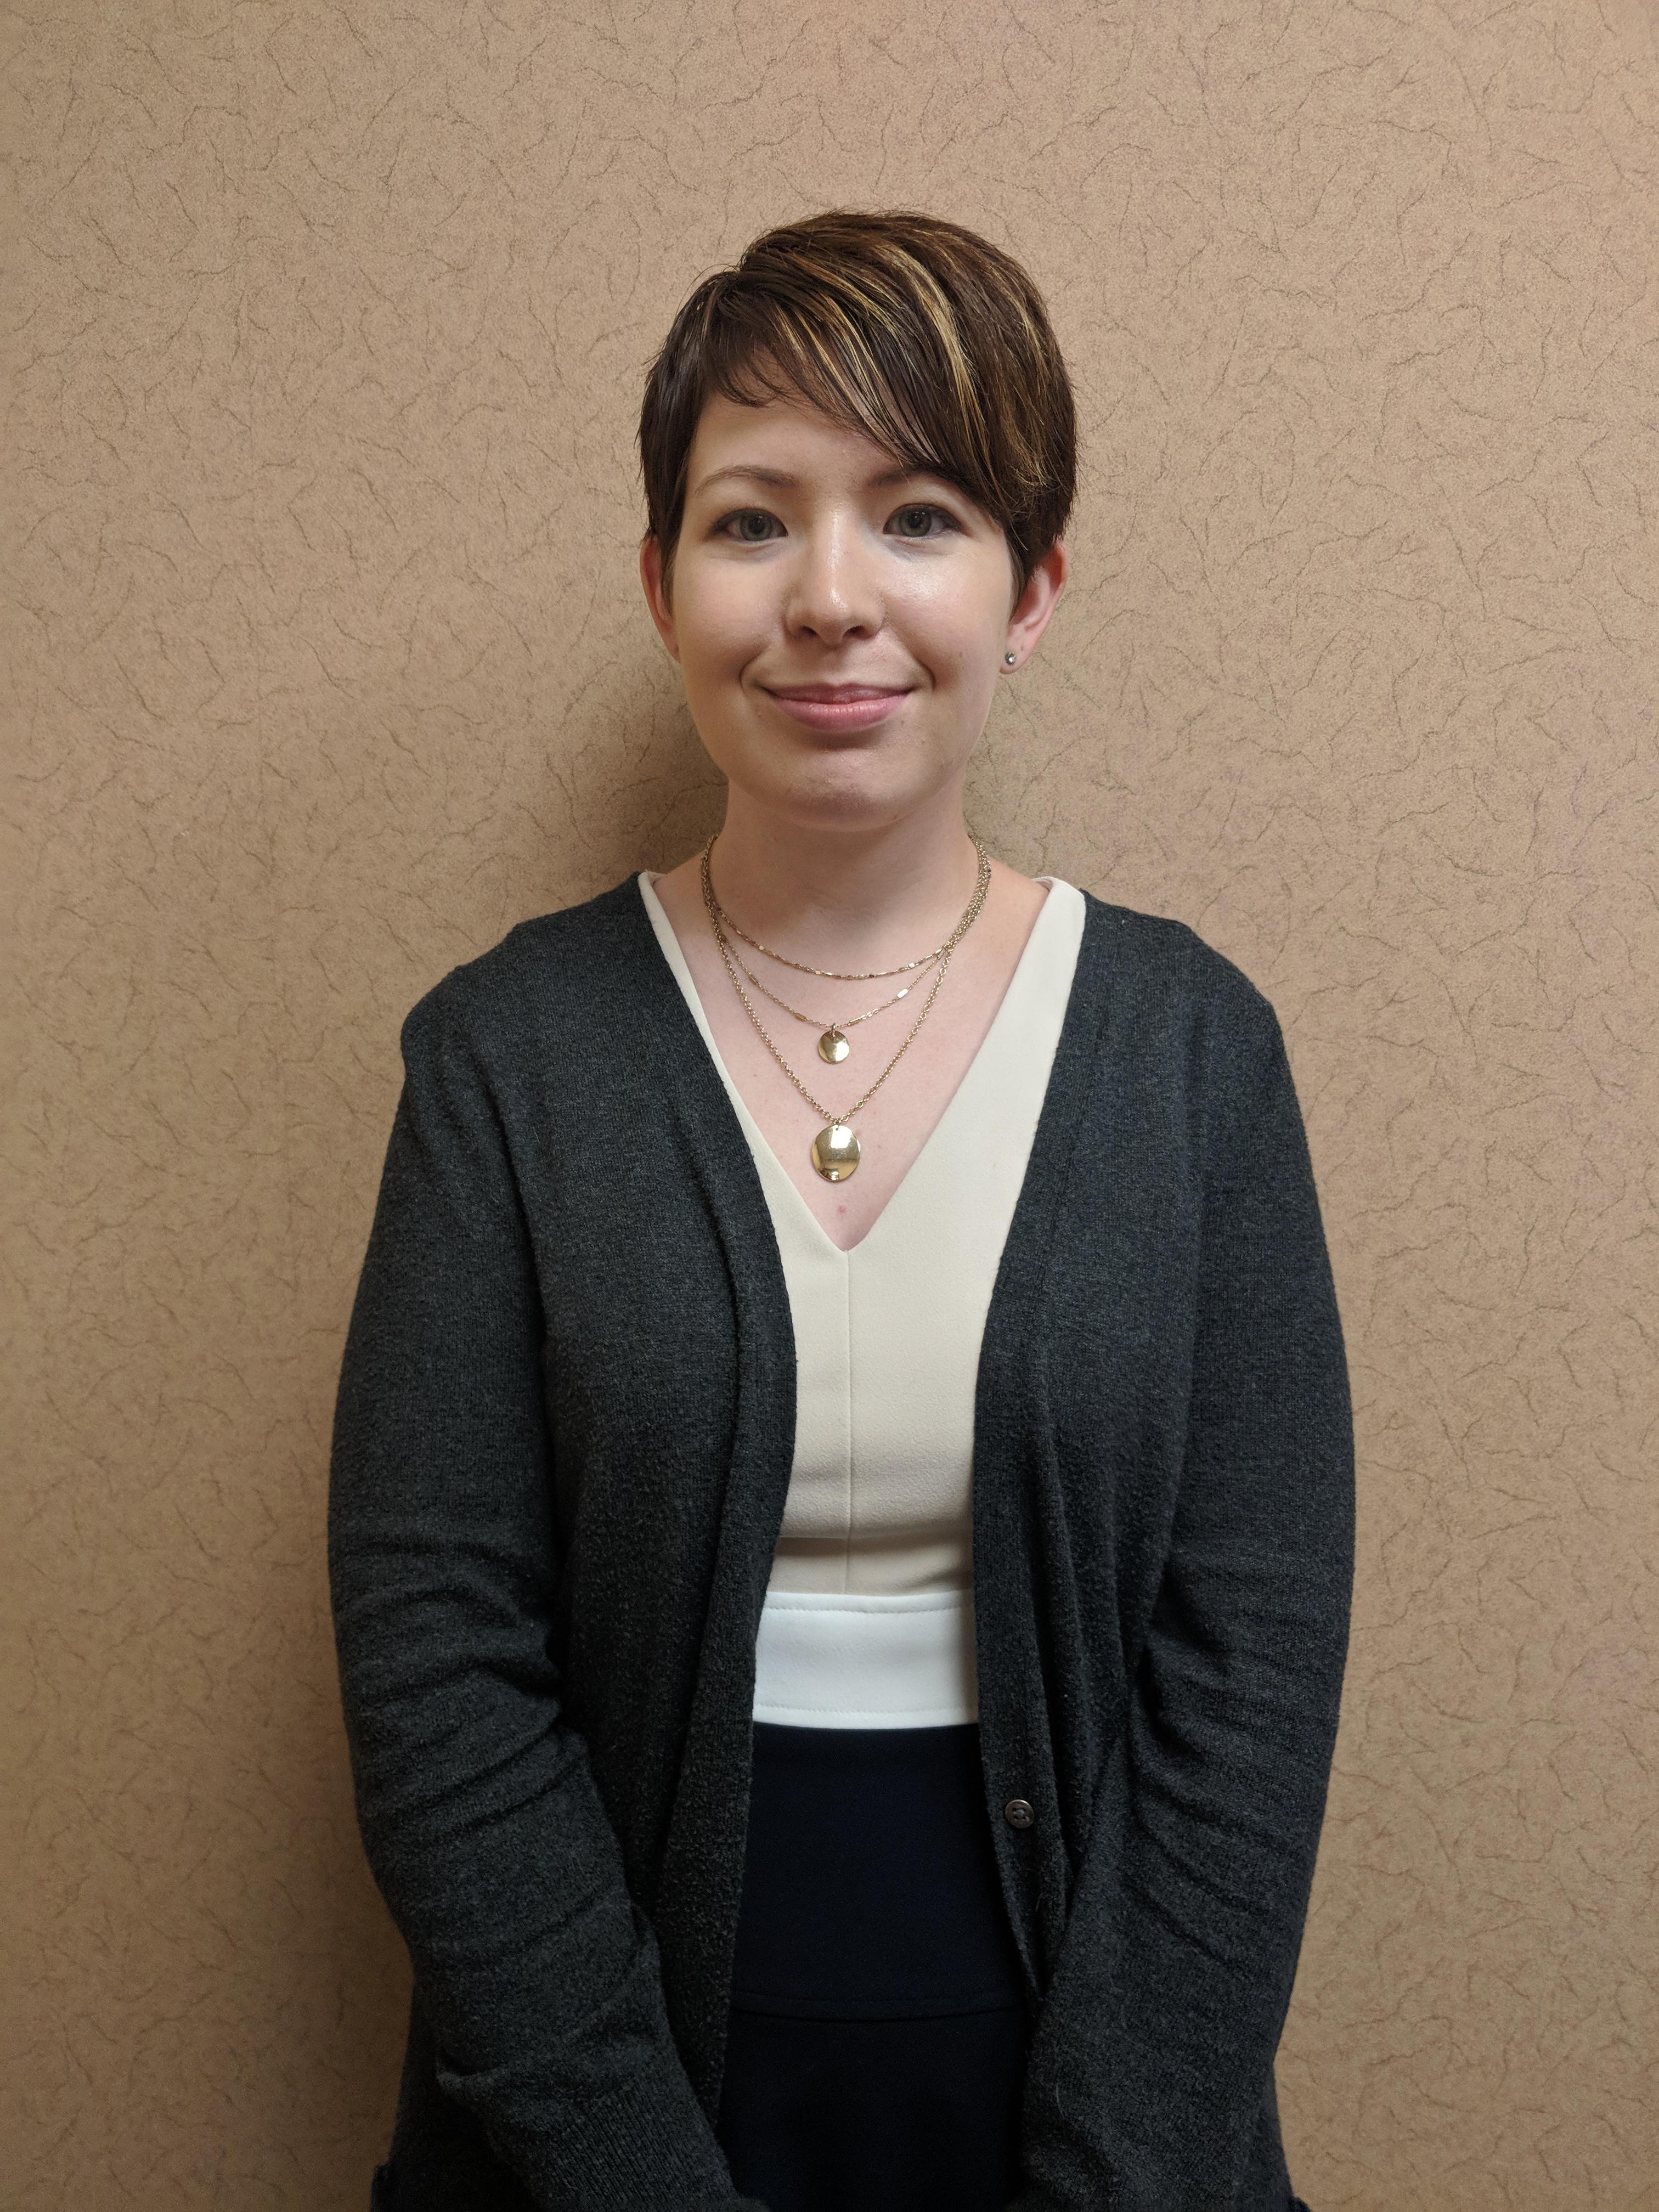 Abbybank Employee Earns Banking Diploma Certificate Of Executive